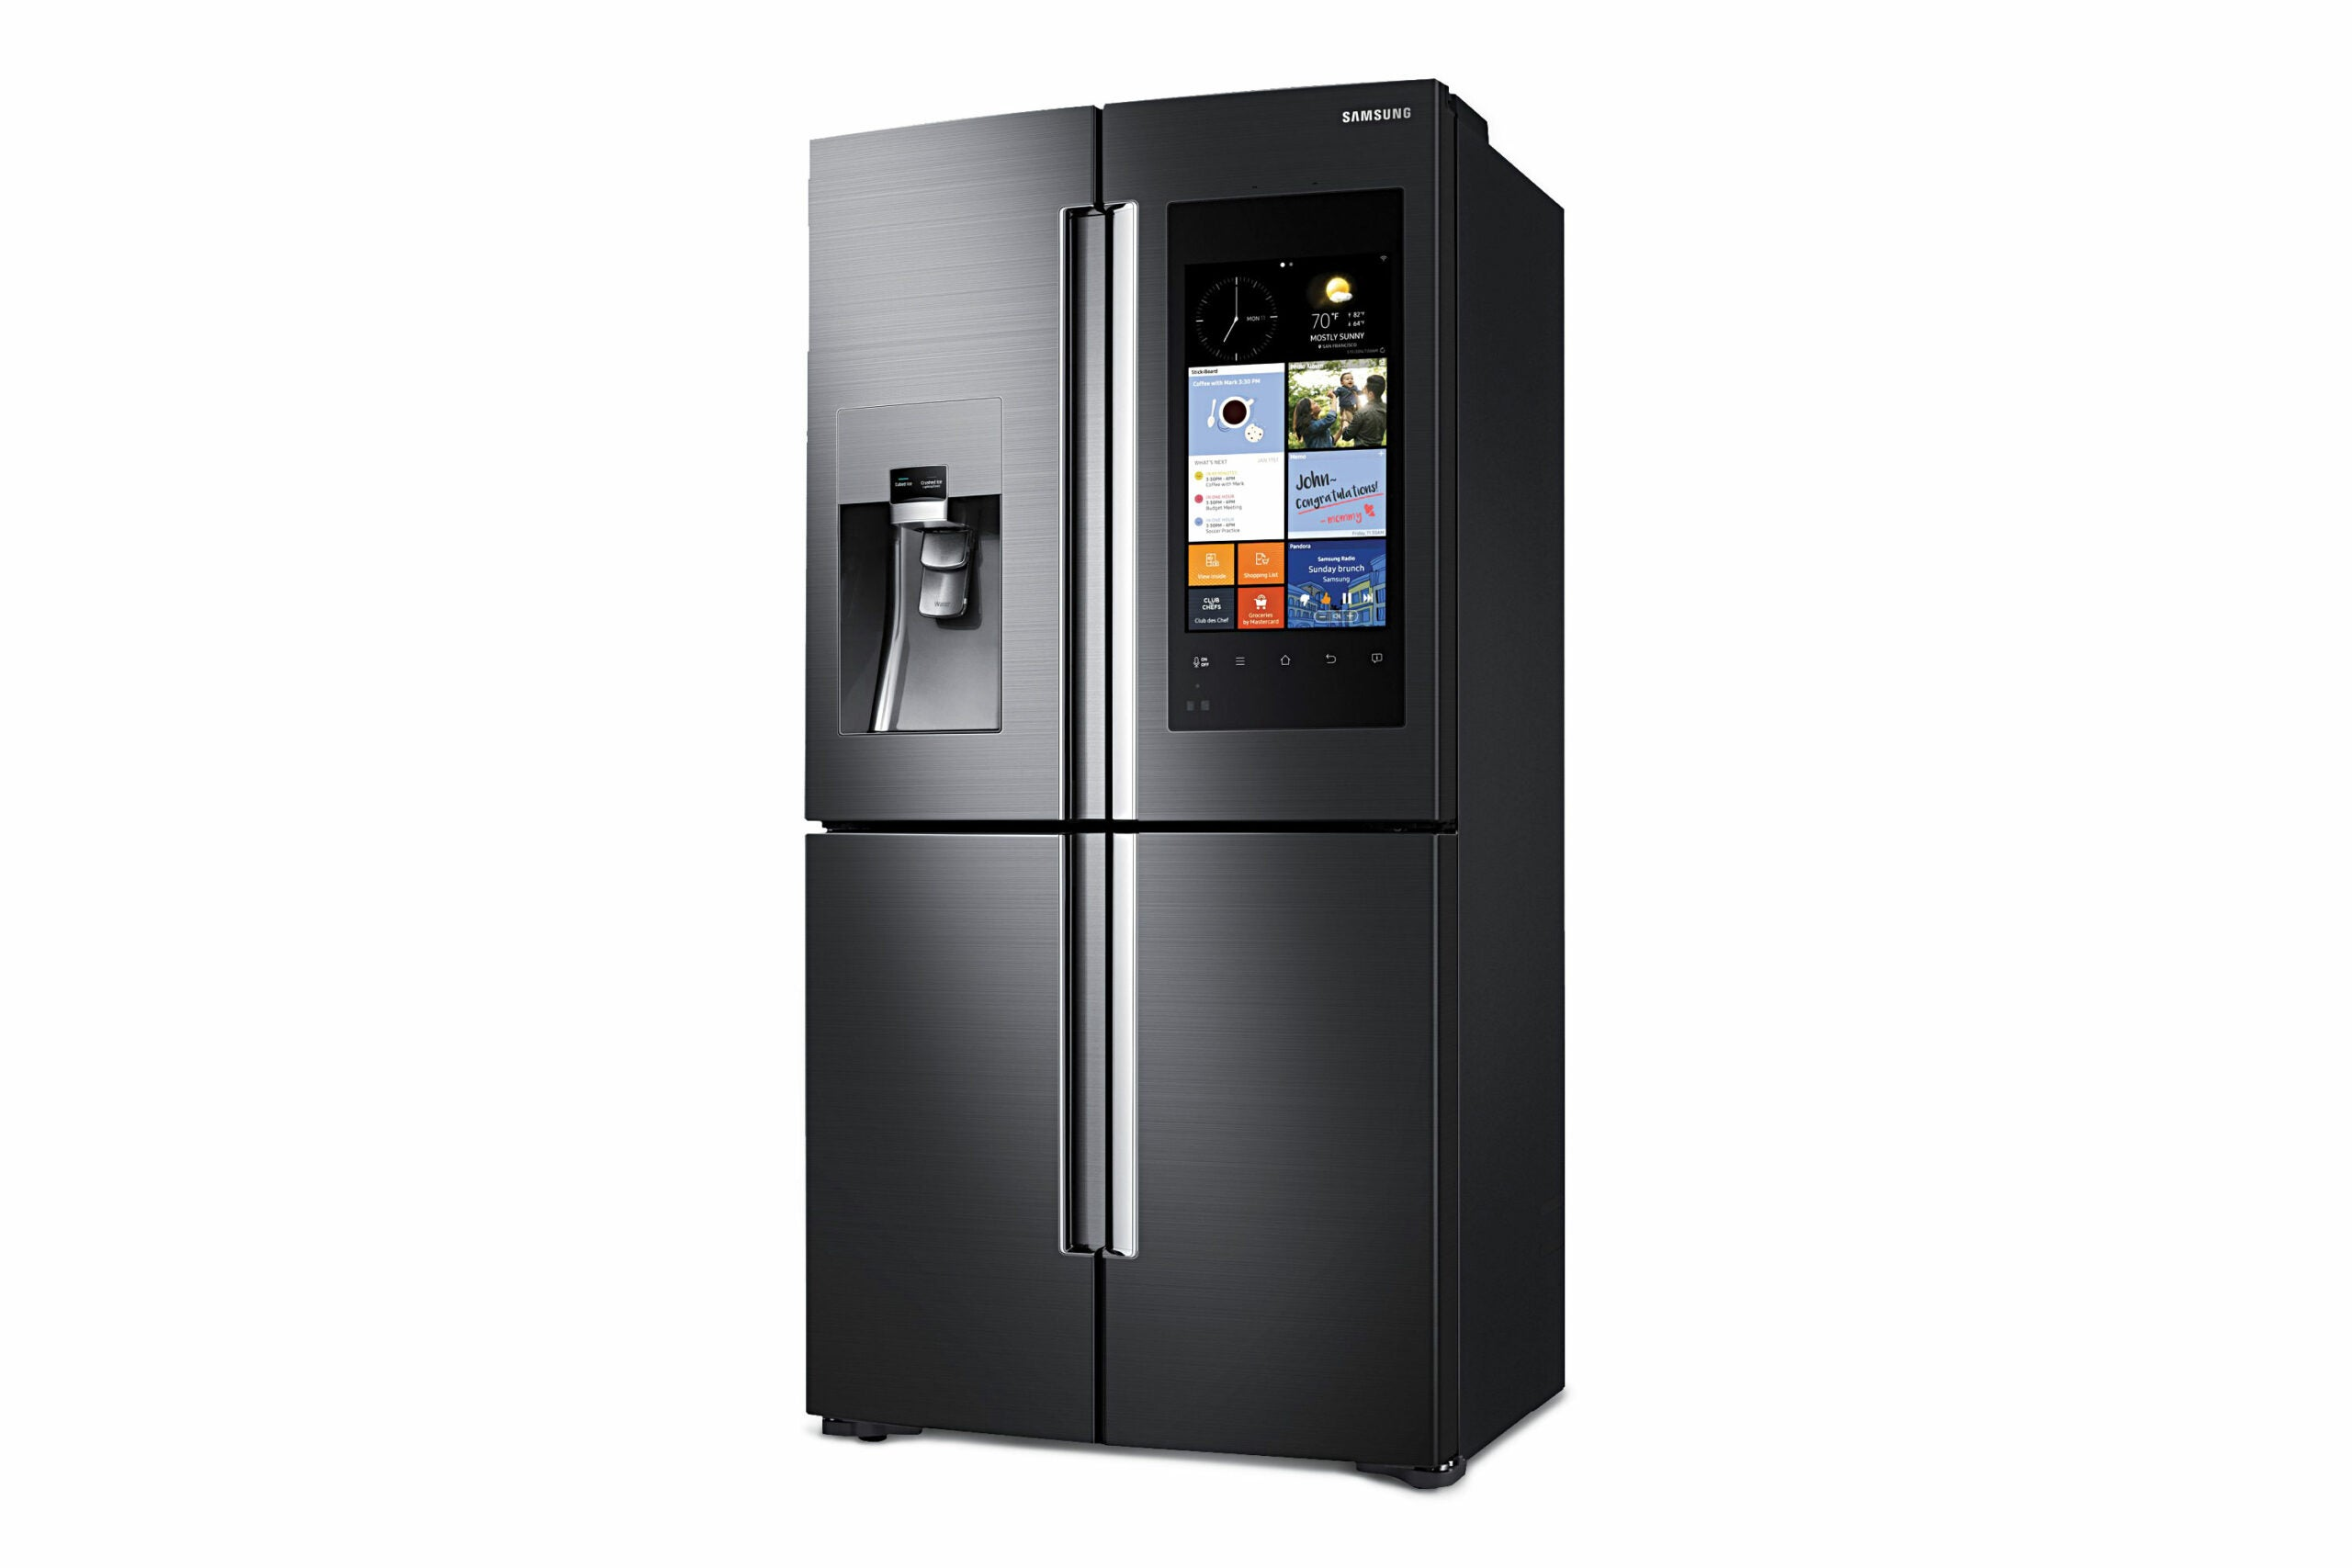 Samsung Family Hub Refrigerator: A Fridge That Helps You Shop